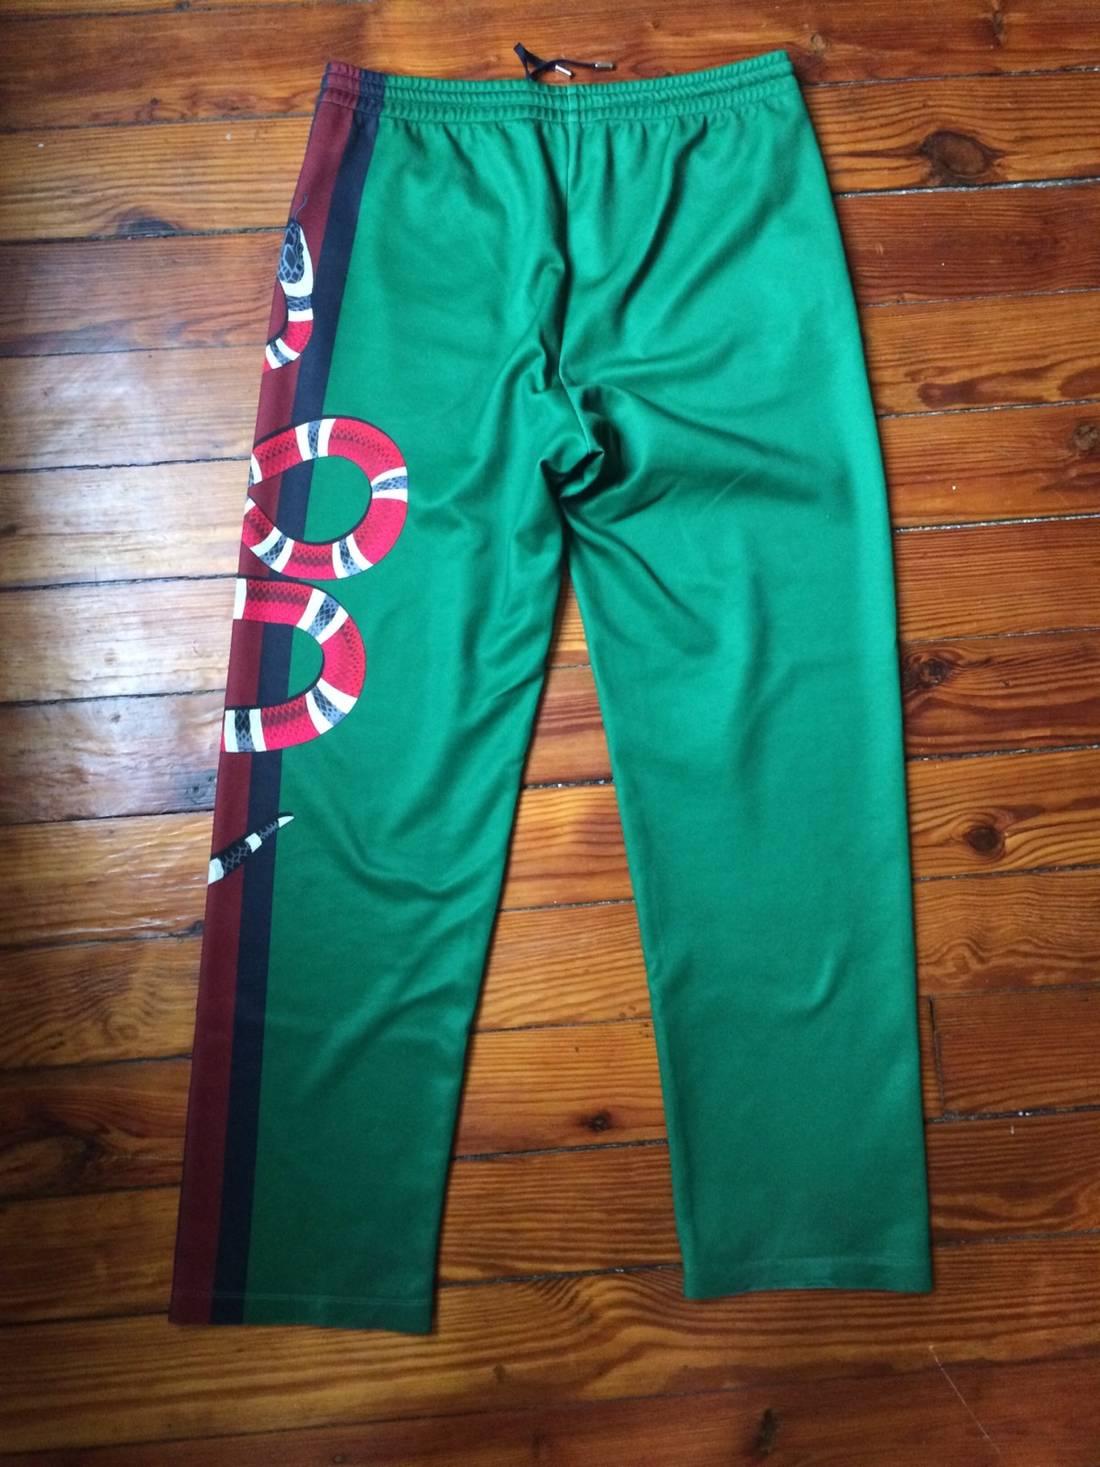 gucci pants. gucci snake track pants size us 31 - 1